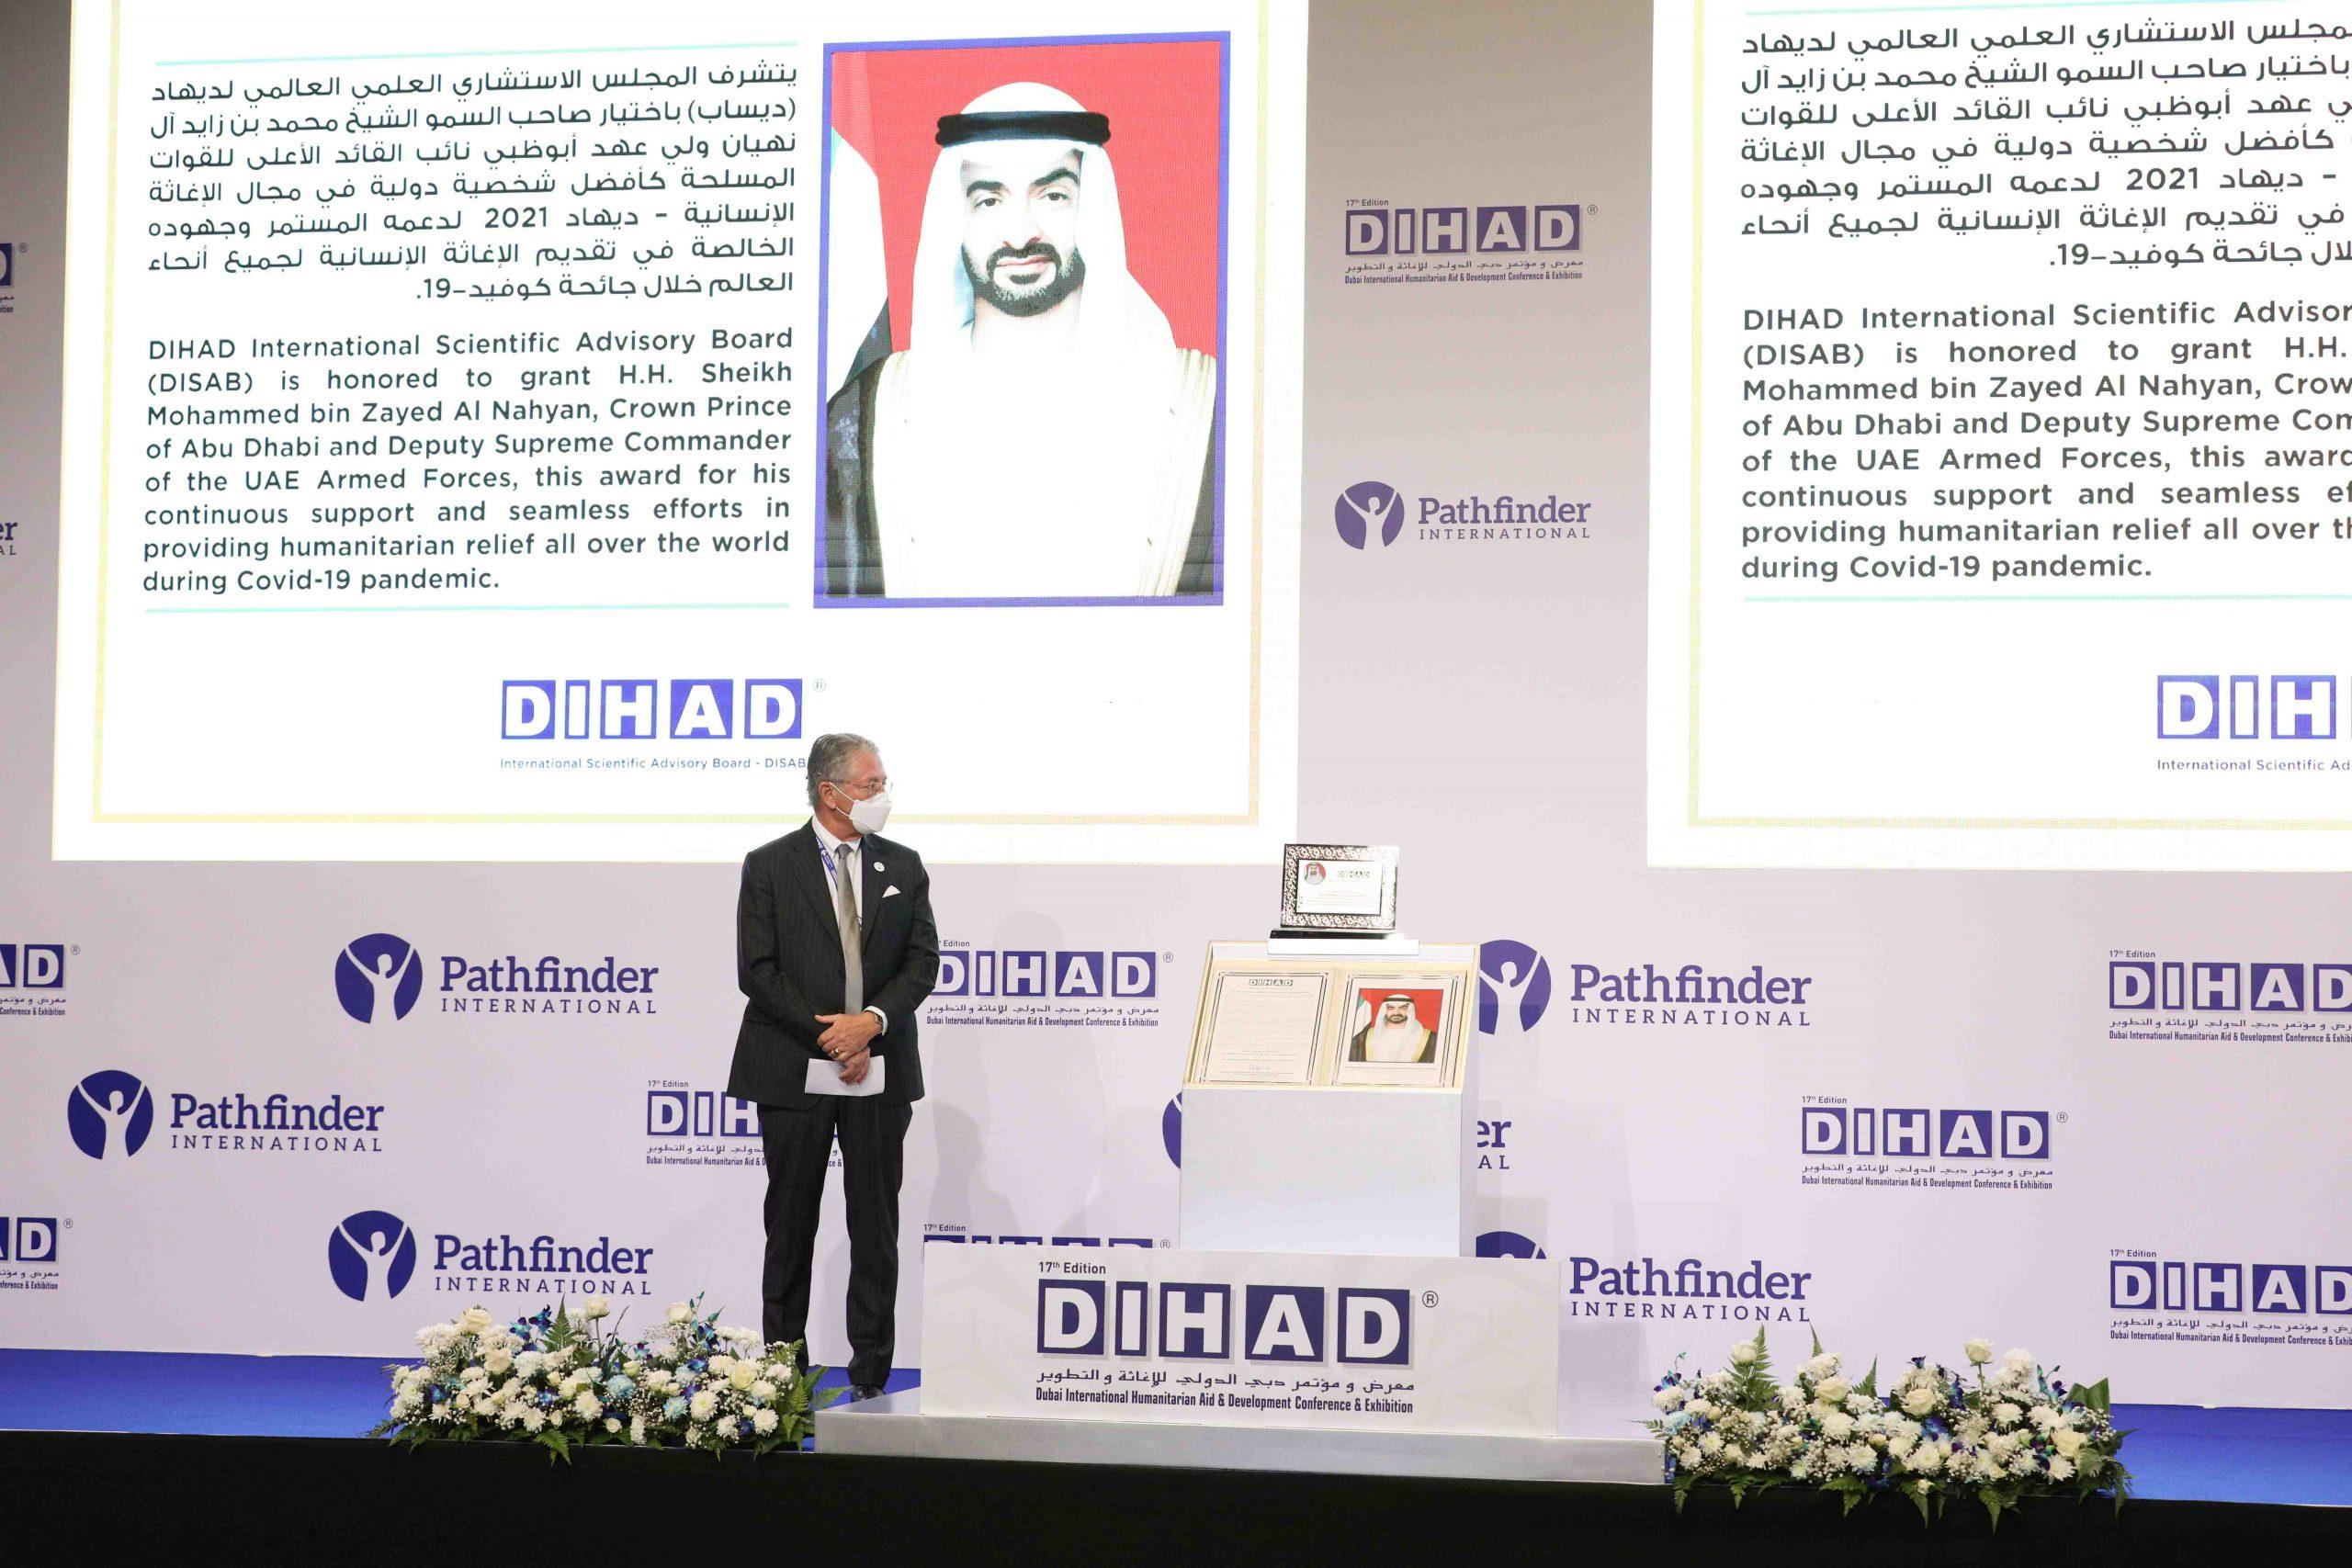 Sheikh Mohamed gets award for humanitarian aid efforts